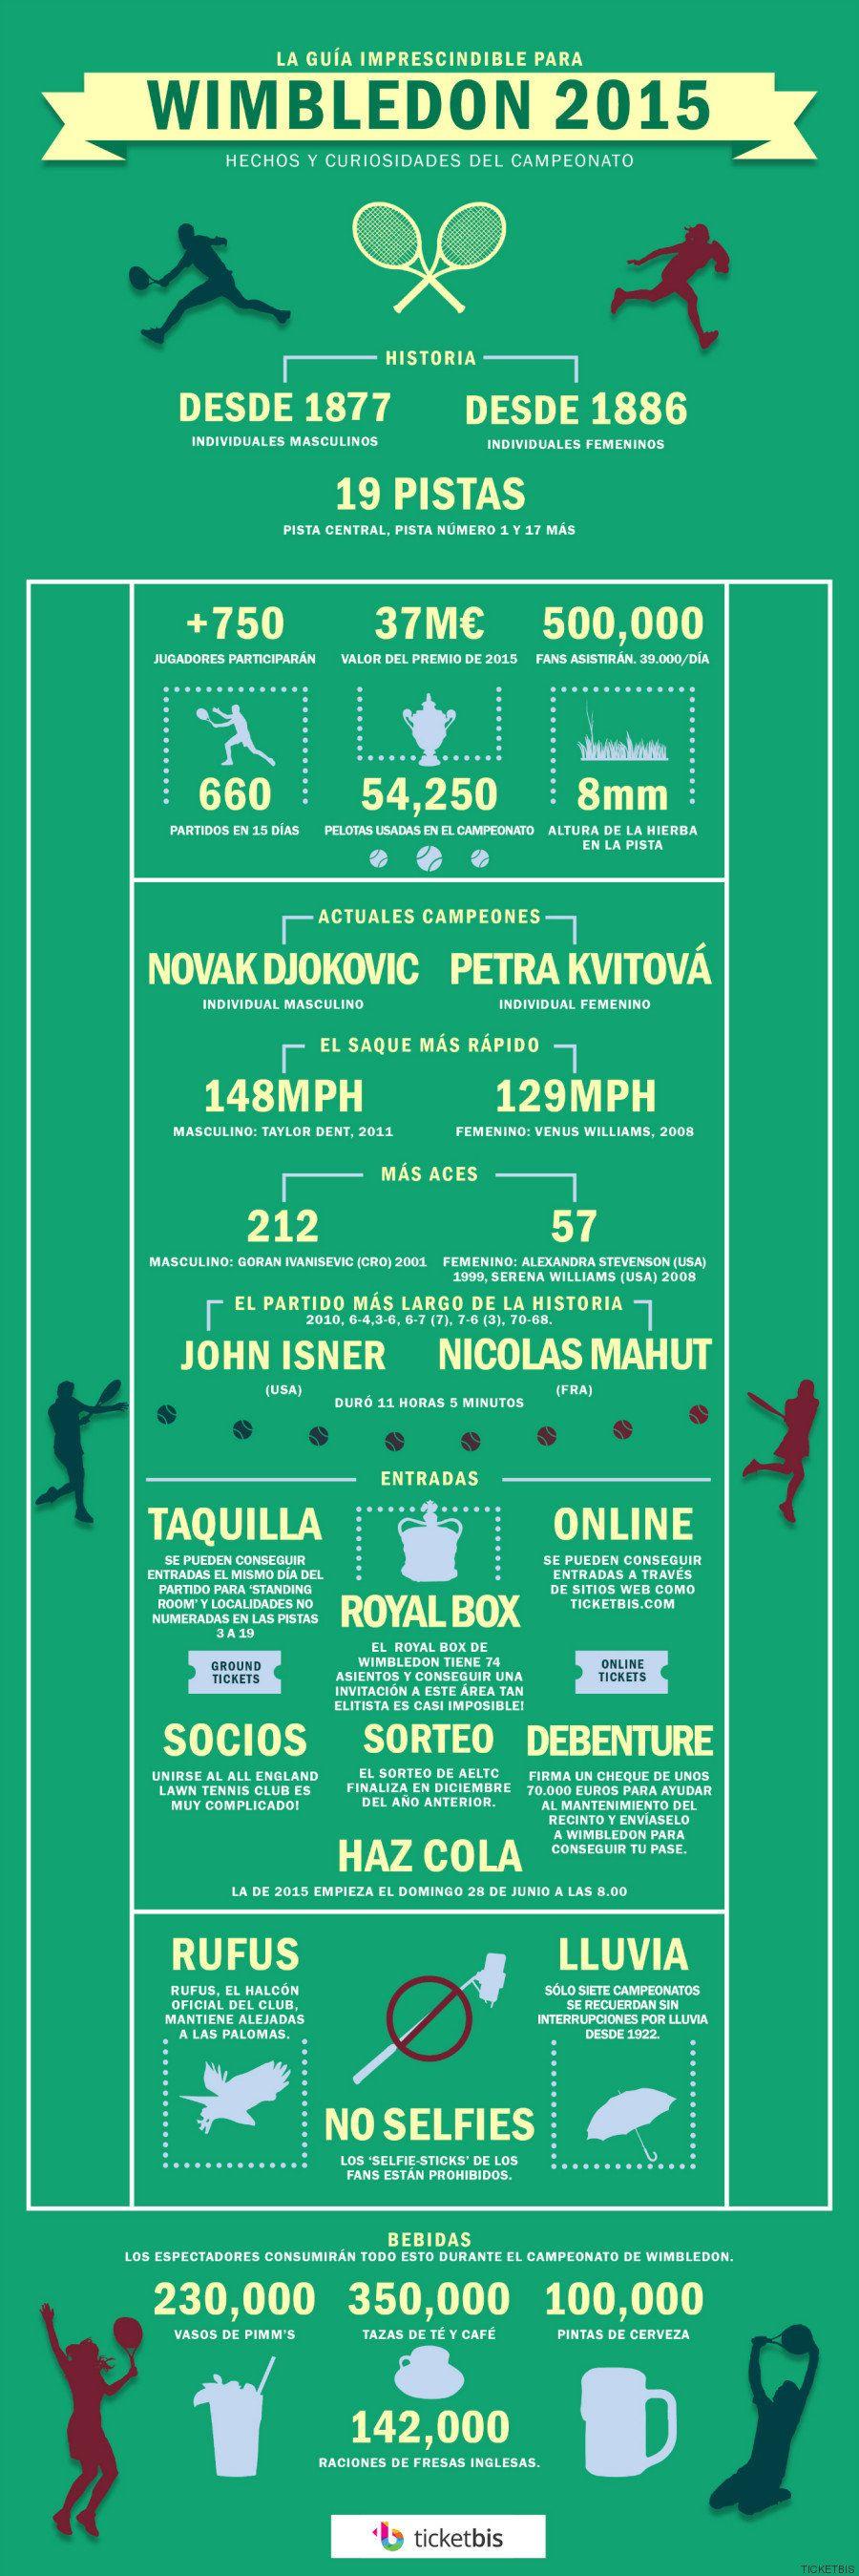 Wimbledon para dummies: 26 cosas que no sabes sobre este torneo de